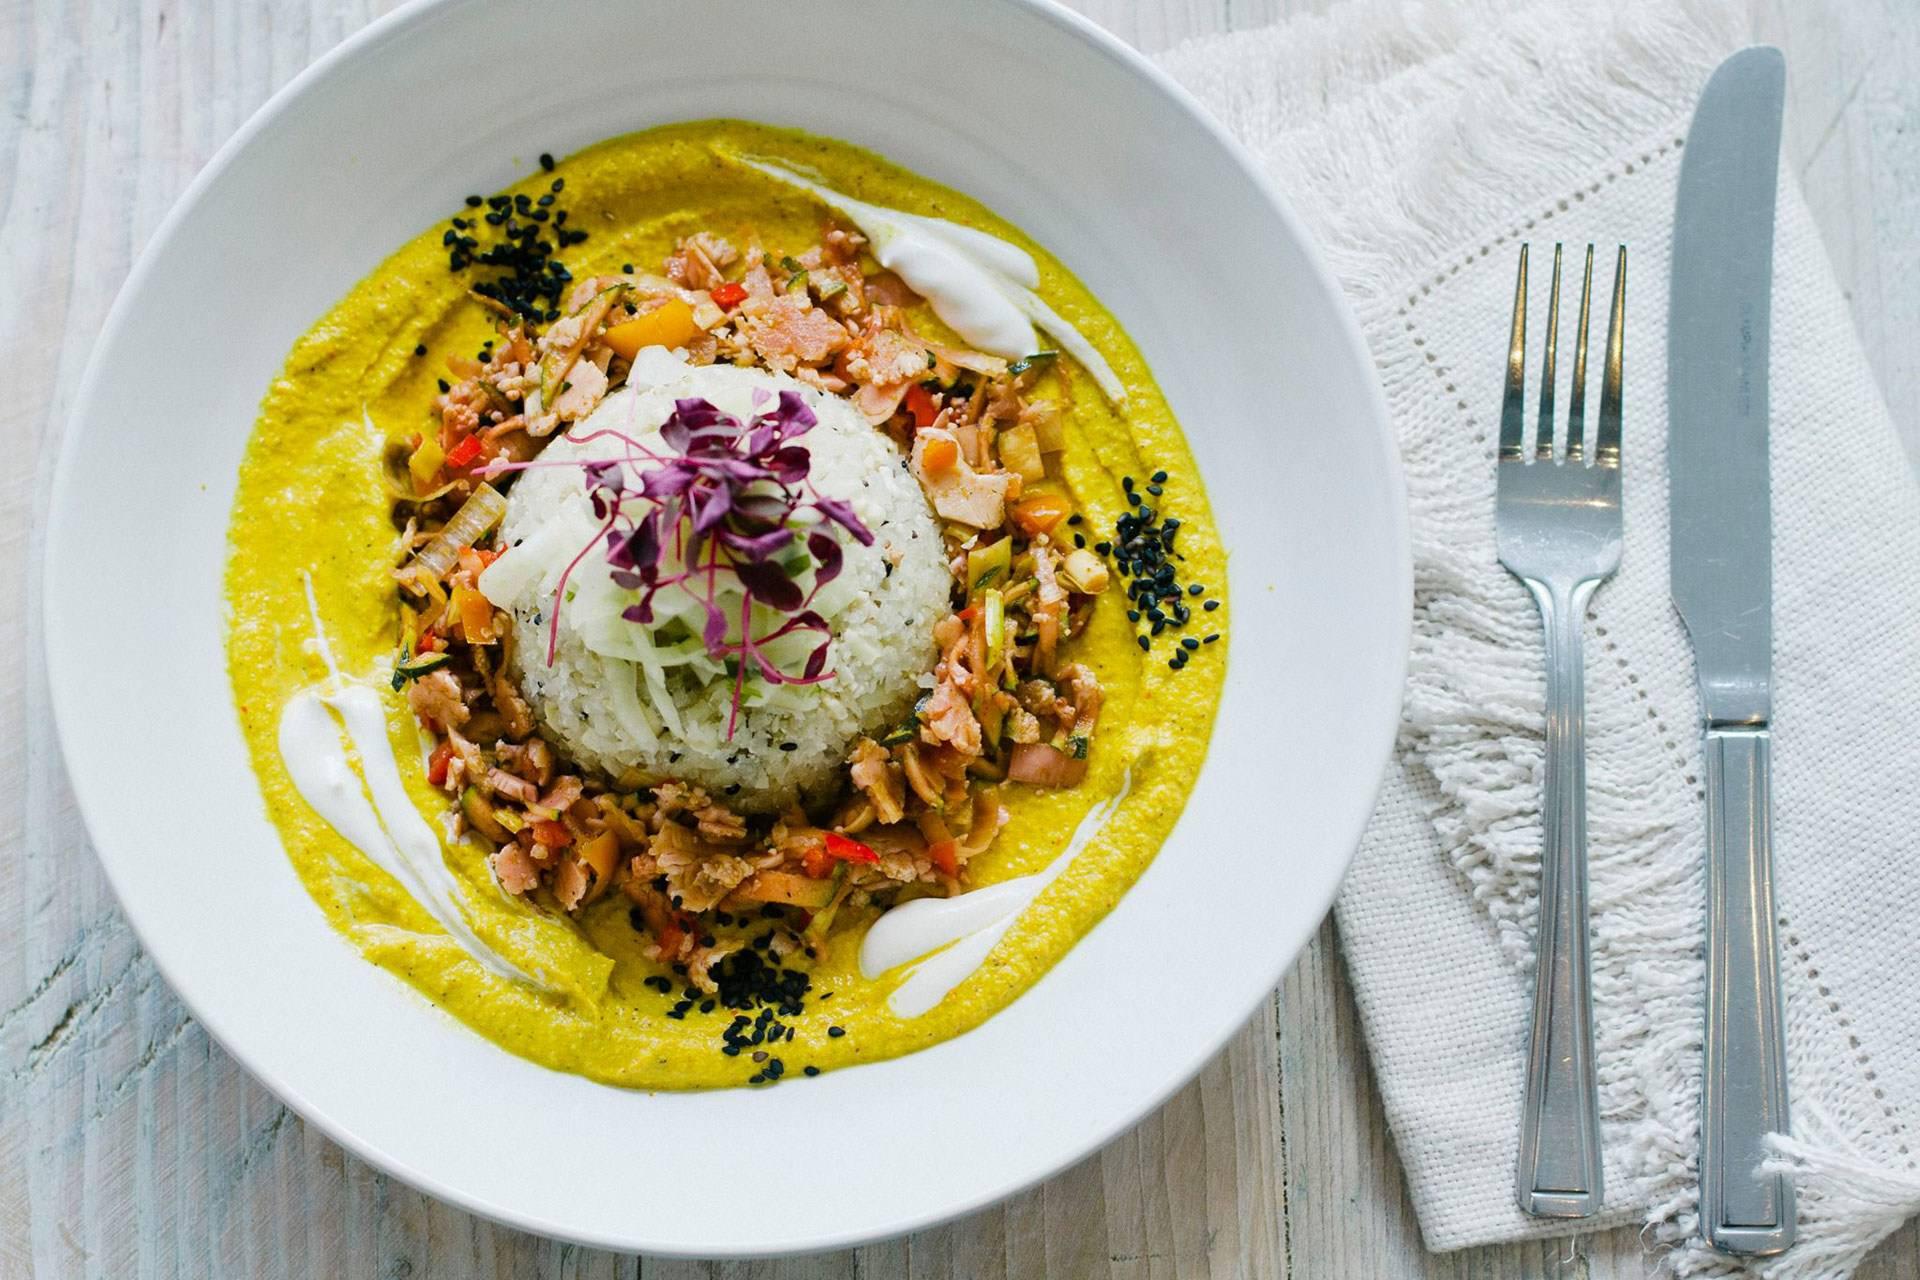 thai-curry-at-nama-vegan-restaurant-london-conde-nast-traveller-25march15-facebook